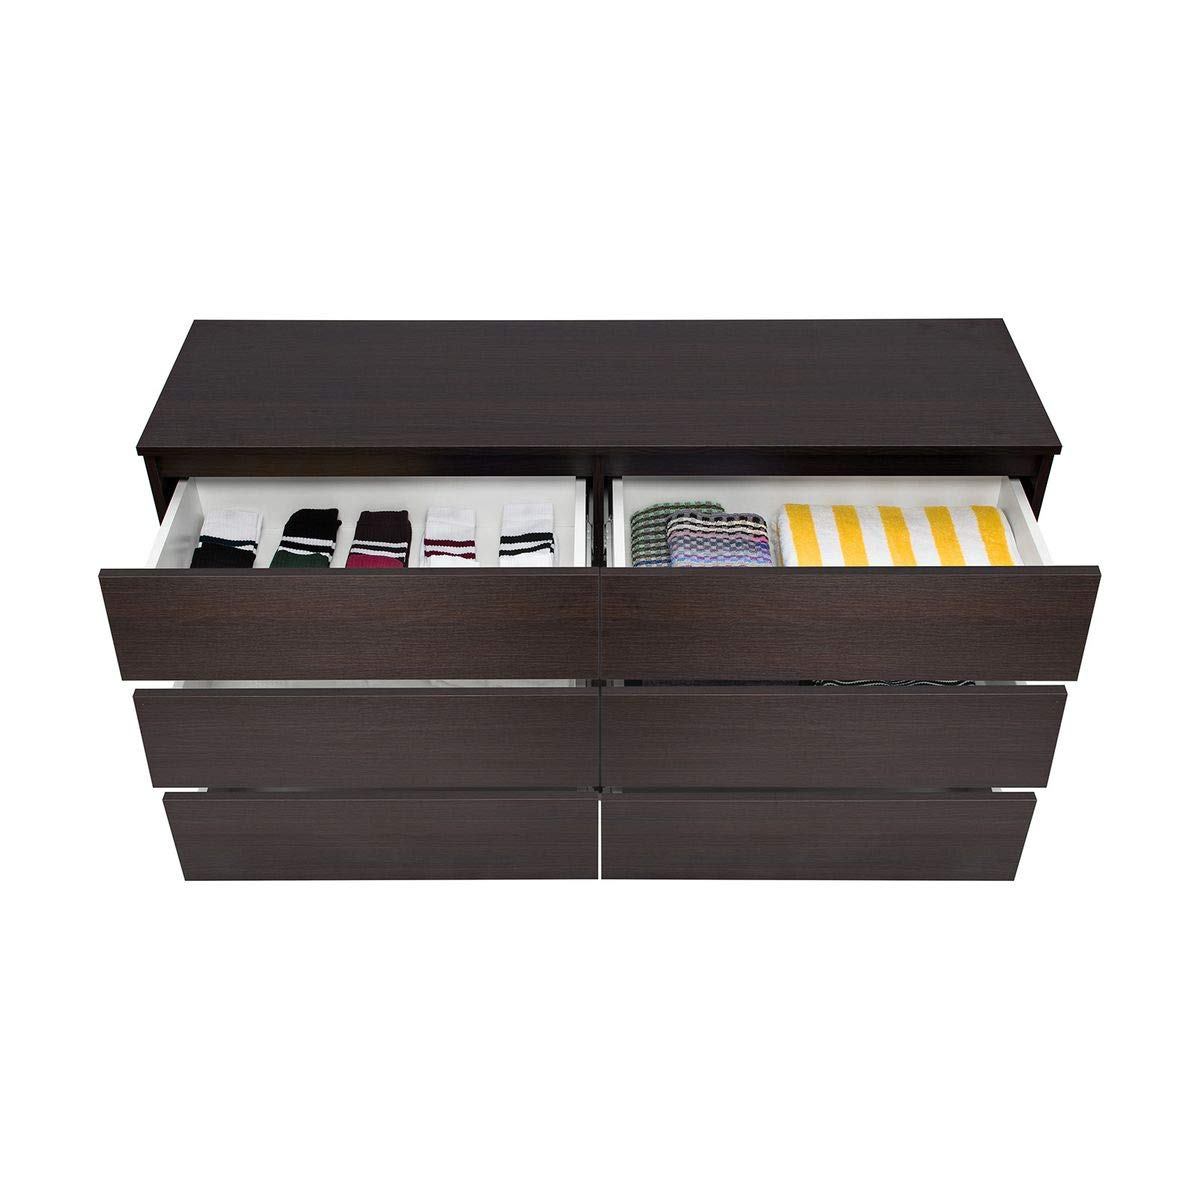 Galdem® Commode à 6tiroirs 140cm Multi-usages Buffet Armoire Buffet Couloir Couloir Salle à Manger Salon Chambre